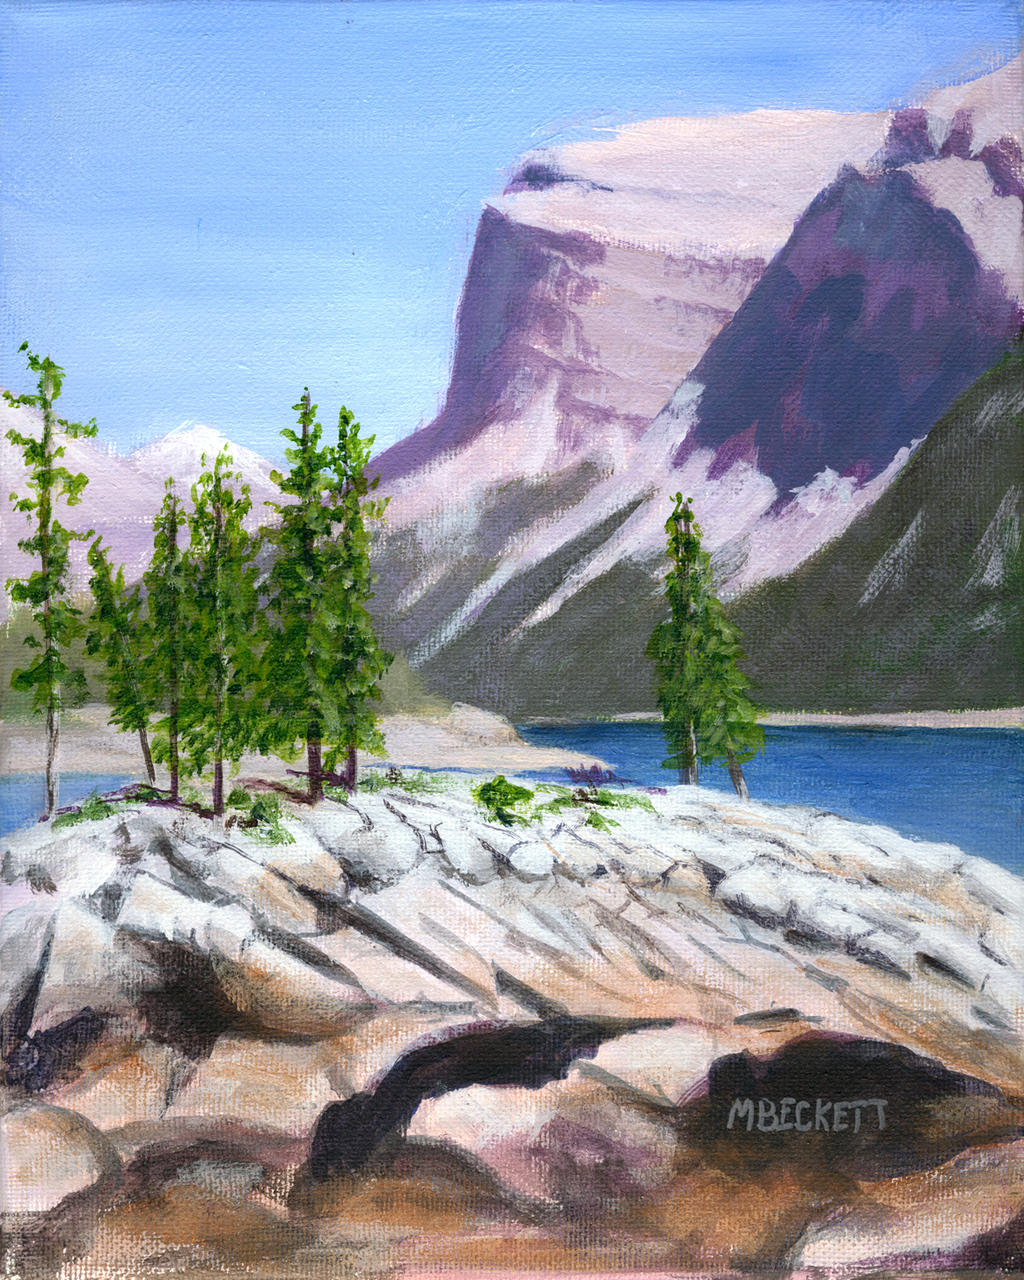 Lake Minnewanka by mbeckett